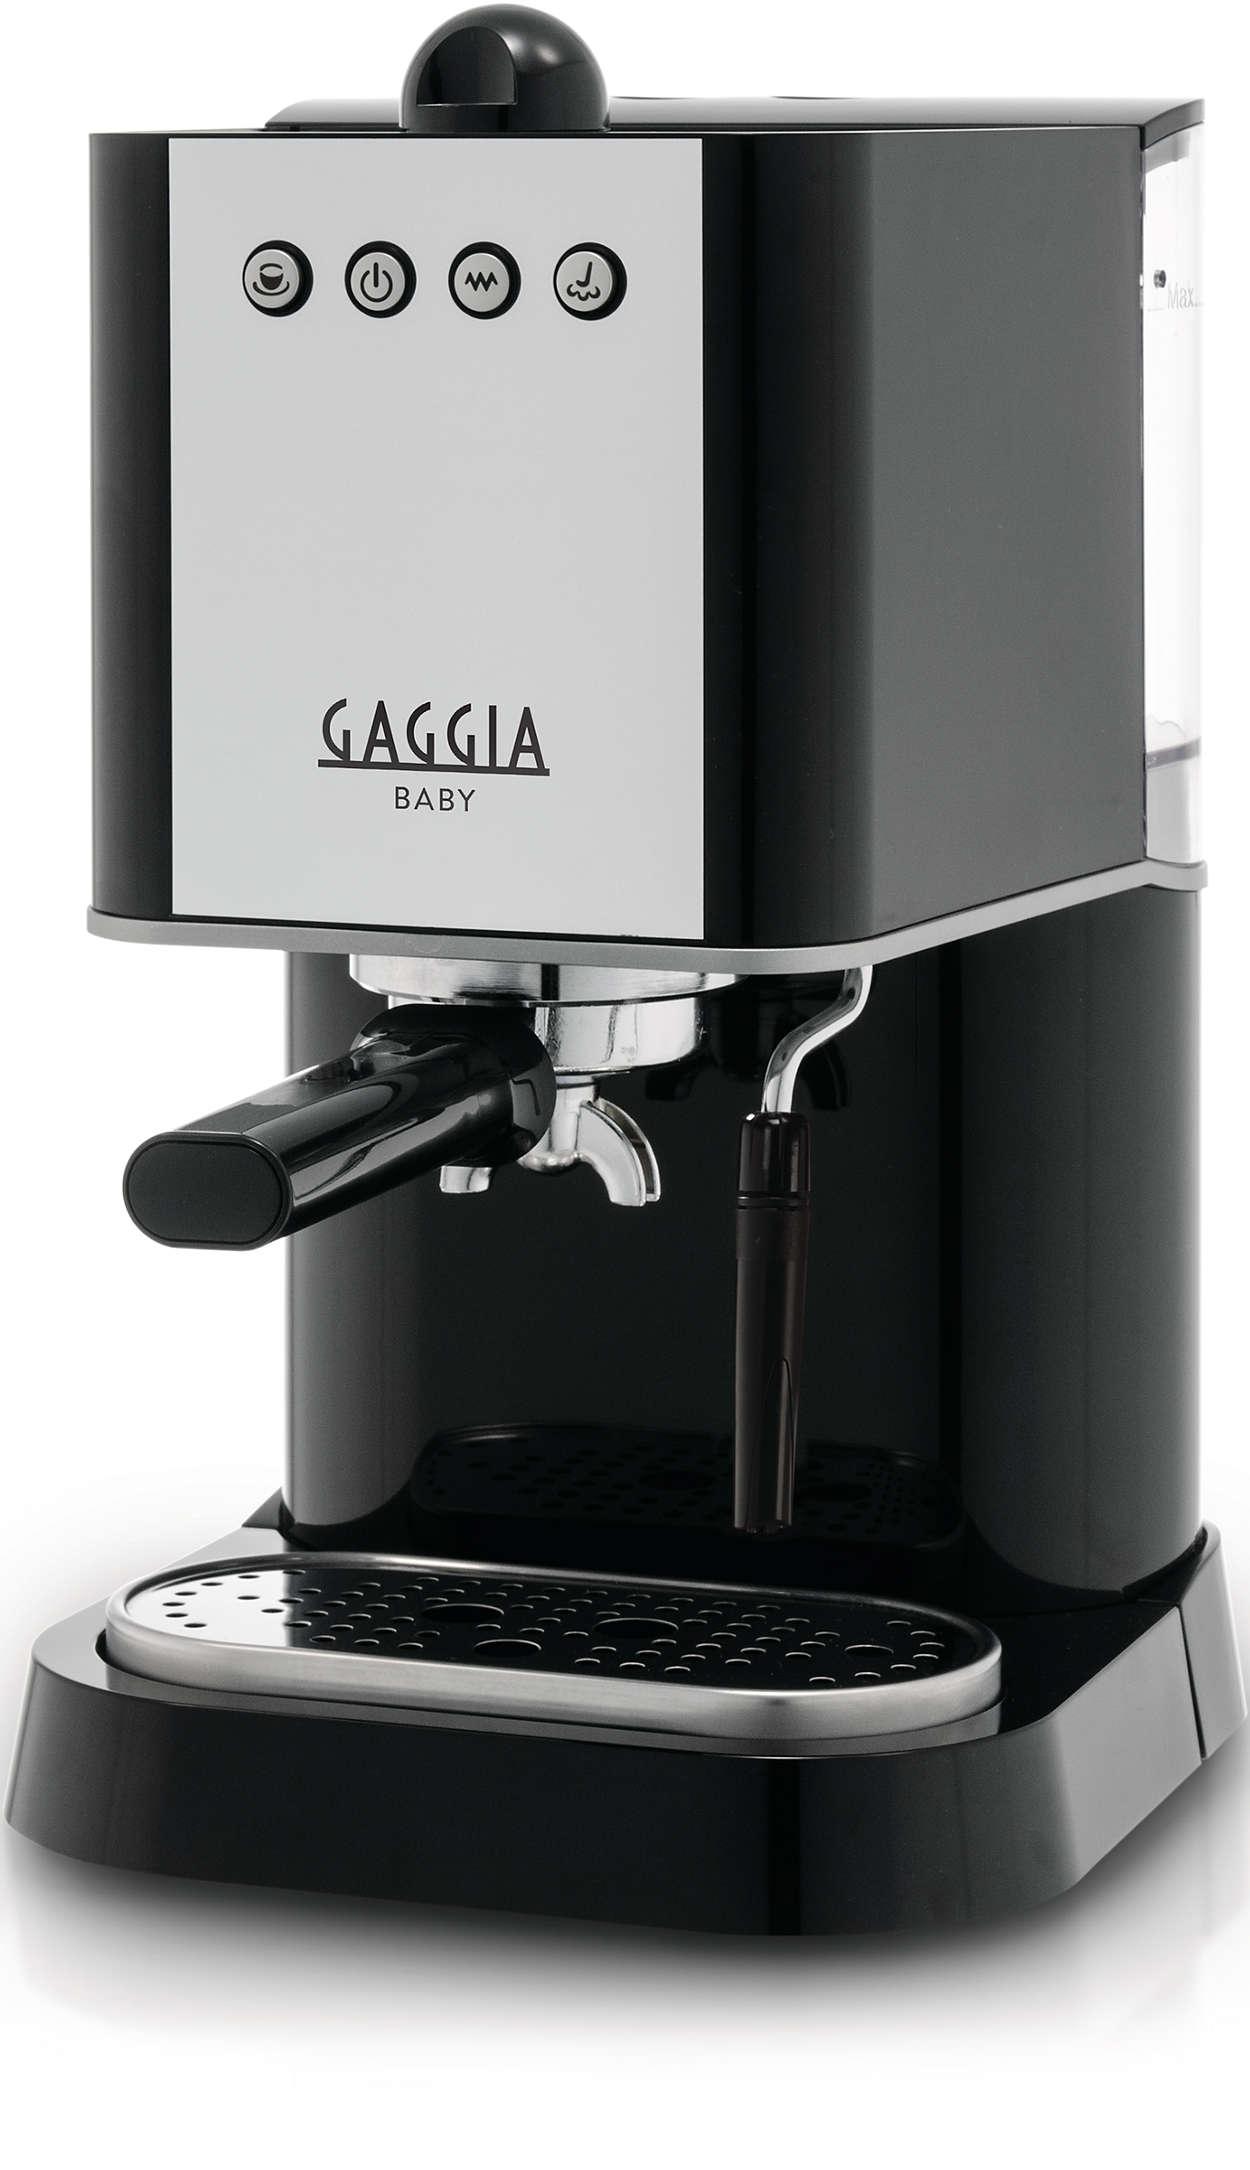 manual espresso machine ri9301 11 gaggia. Black Bedroom Furniture Sets. Home Design Ideas